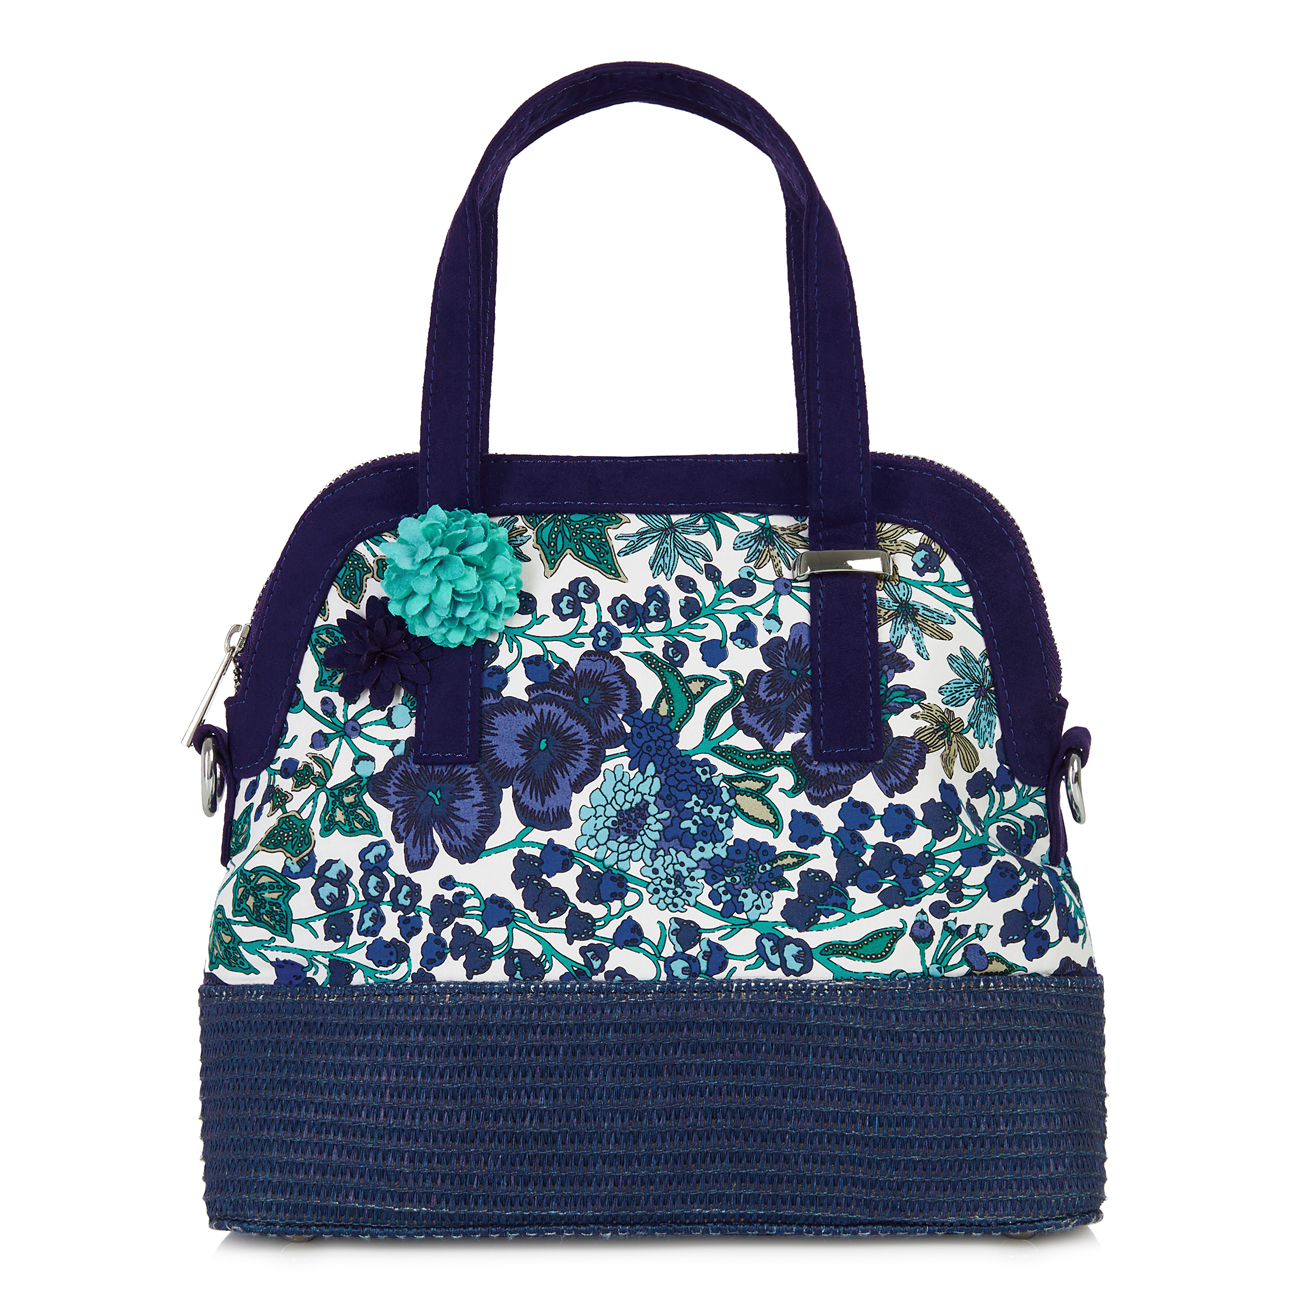 NEW Ruby Shoo Large Curved Lyon Shopper Bag Mango / Blue Floral Flo | EBay